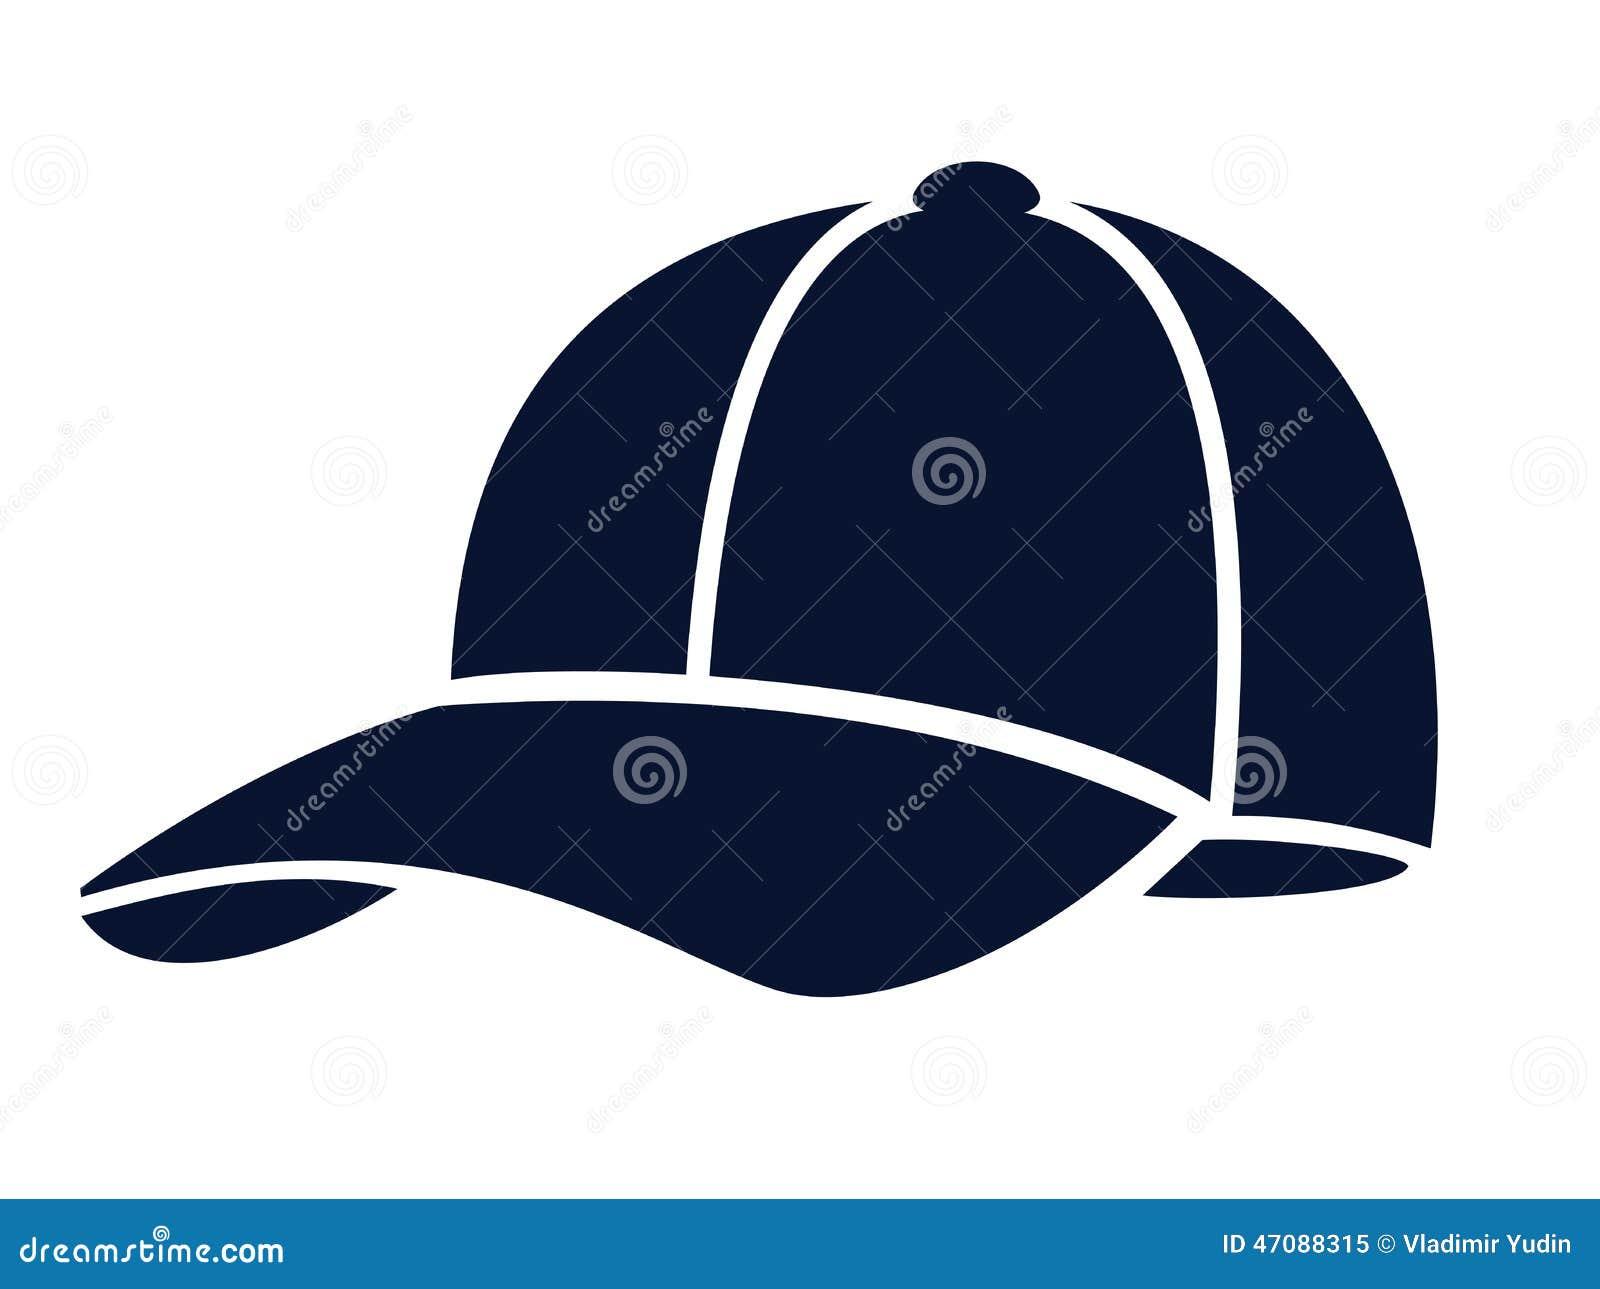 Рисунок на кепку